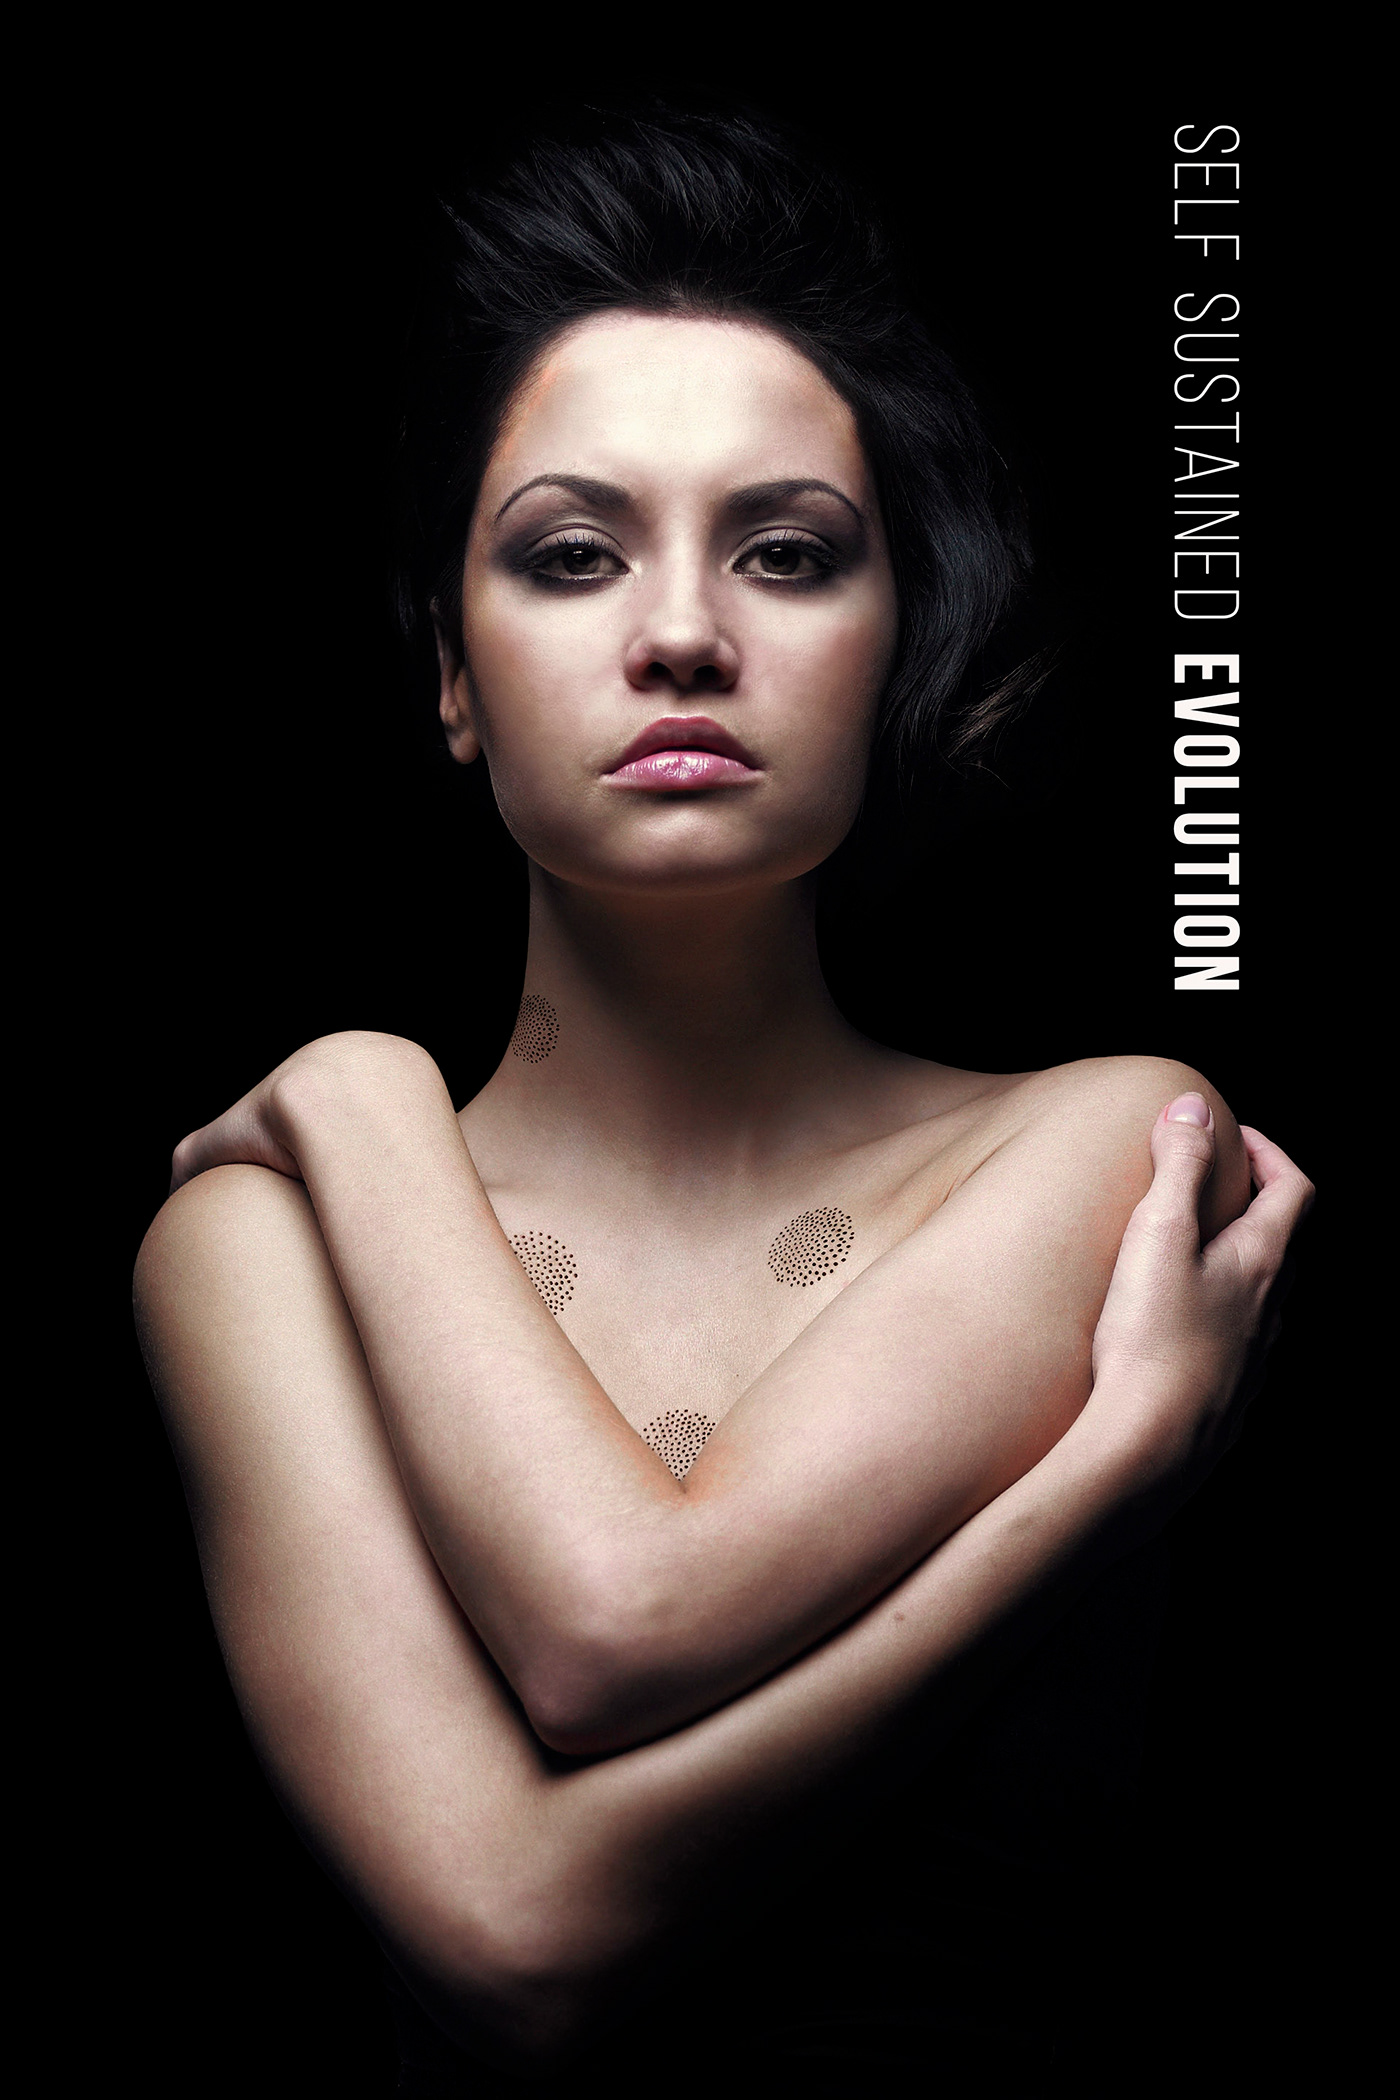 breathe COVID-19 Digital Art  ecosystem evolution female body lungs oxgen mask pollution self sustained